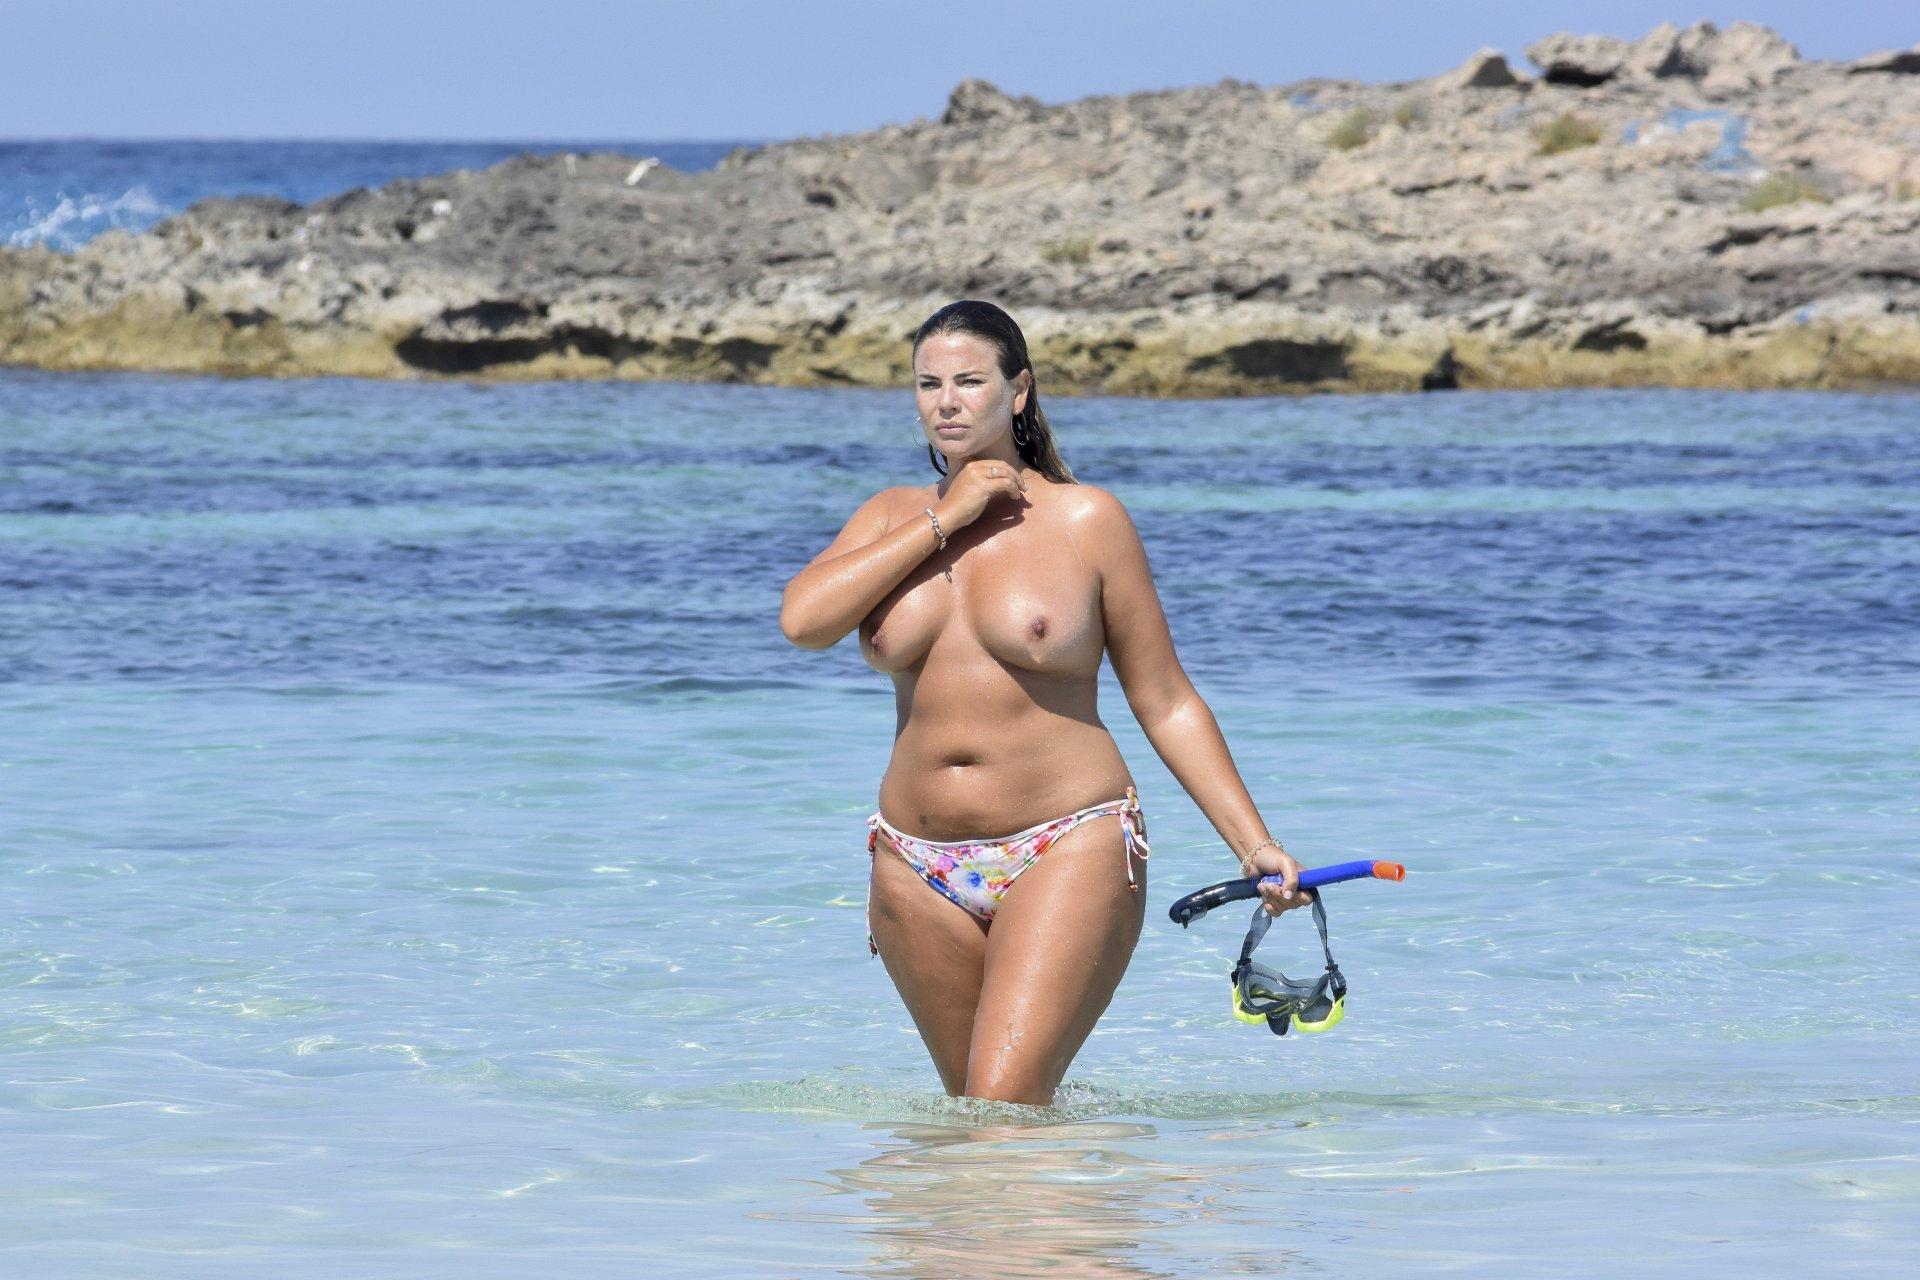 Fiona-Falkiner-Topless-TheFappeningBlog.com-6.jpg